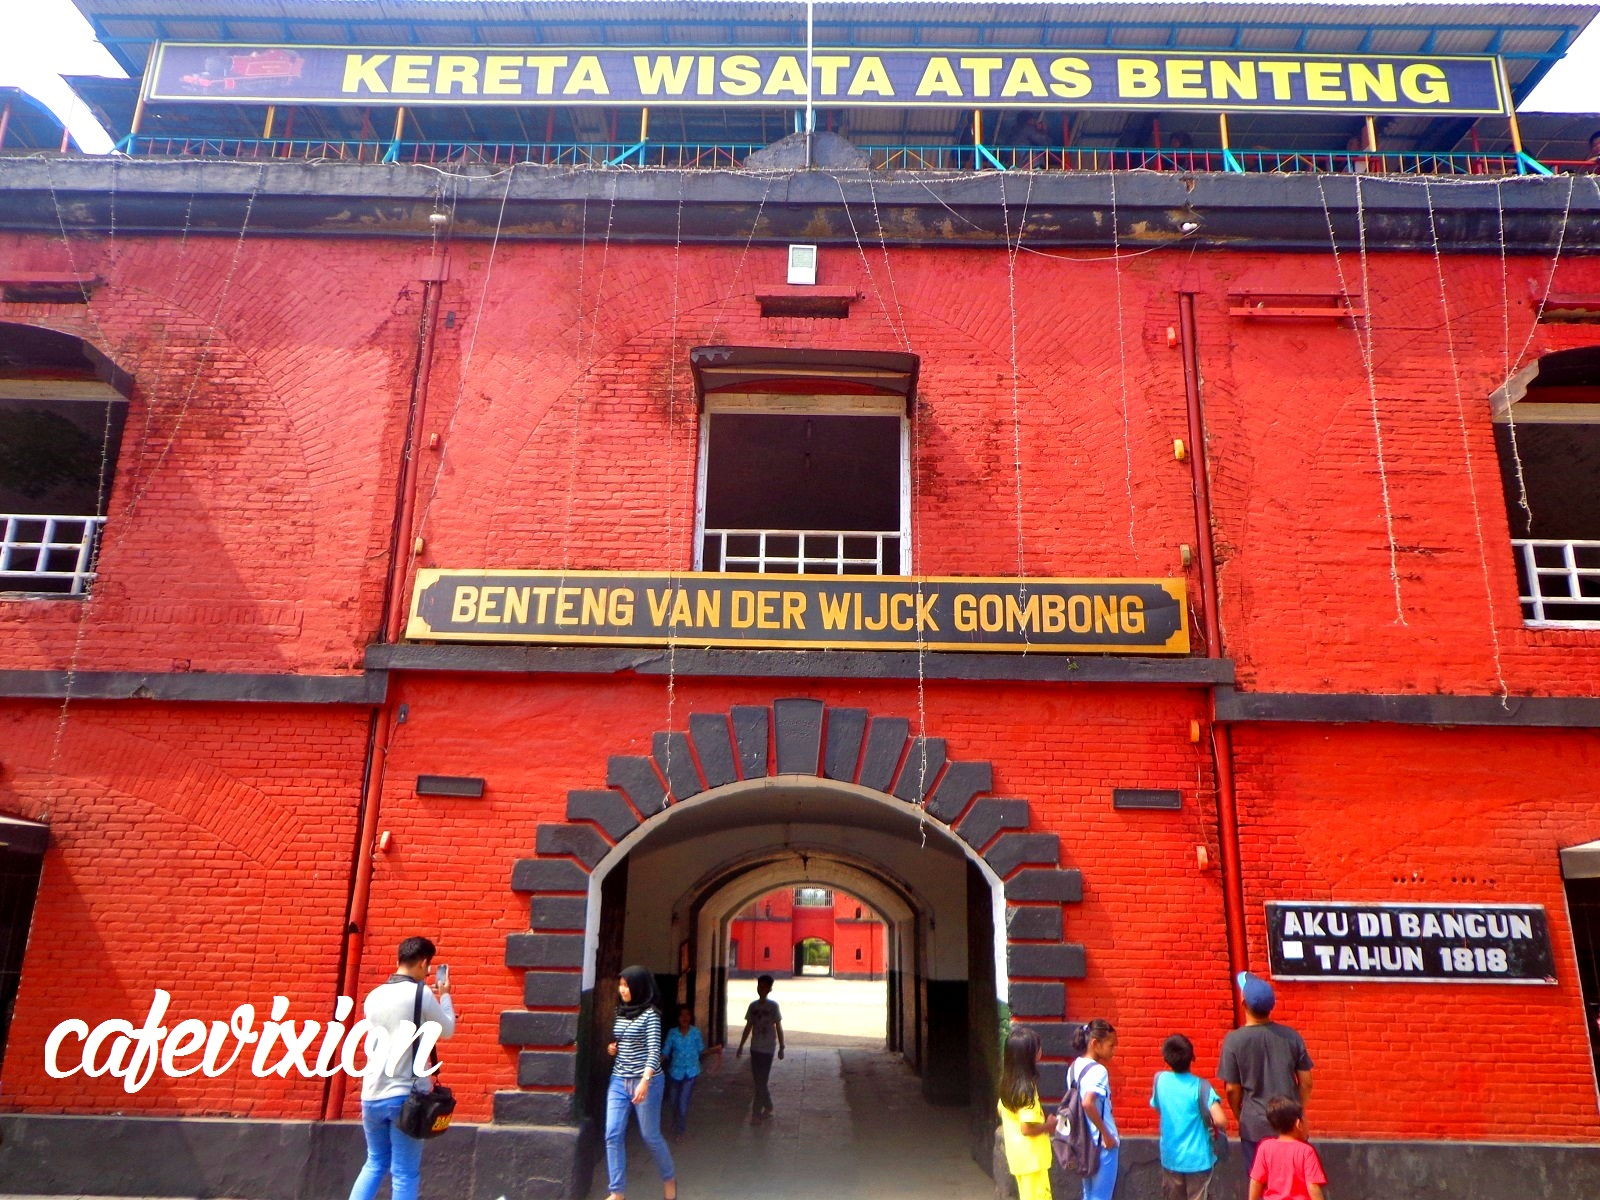 Benteng Van Der Wijck Segi Delapannya Indonesia Hanifdn Terletak Jl